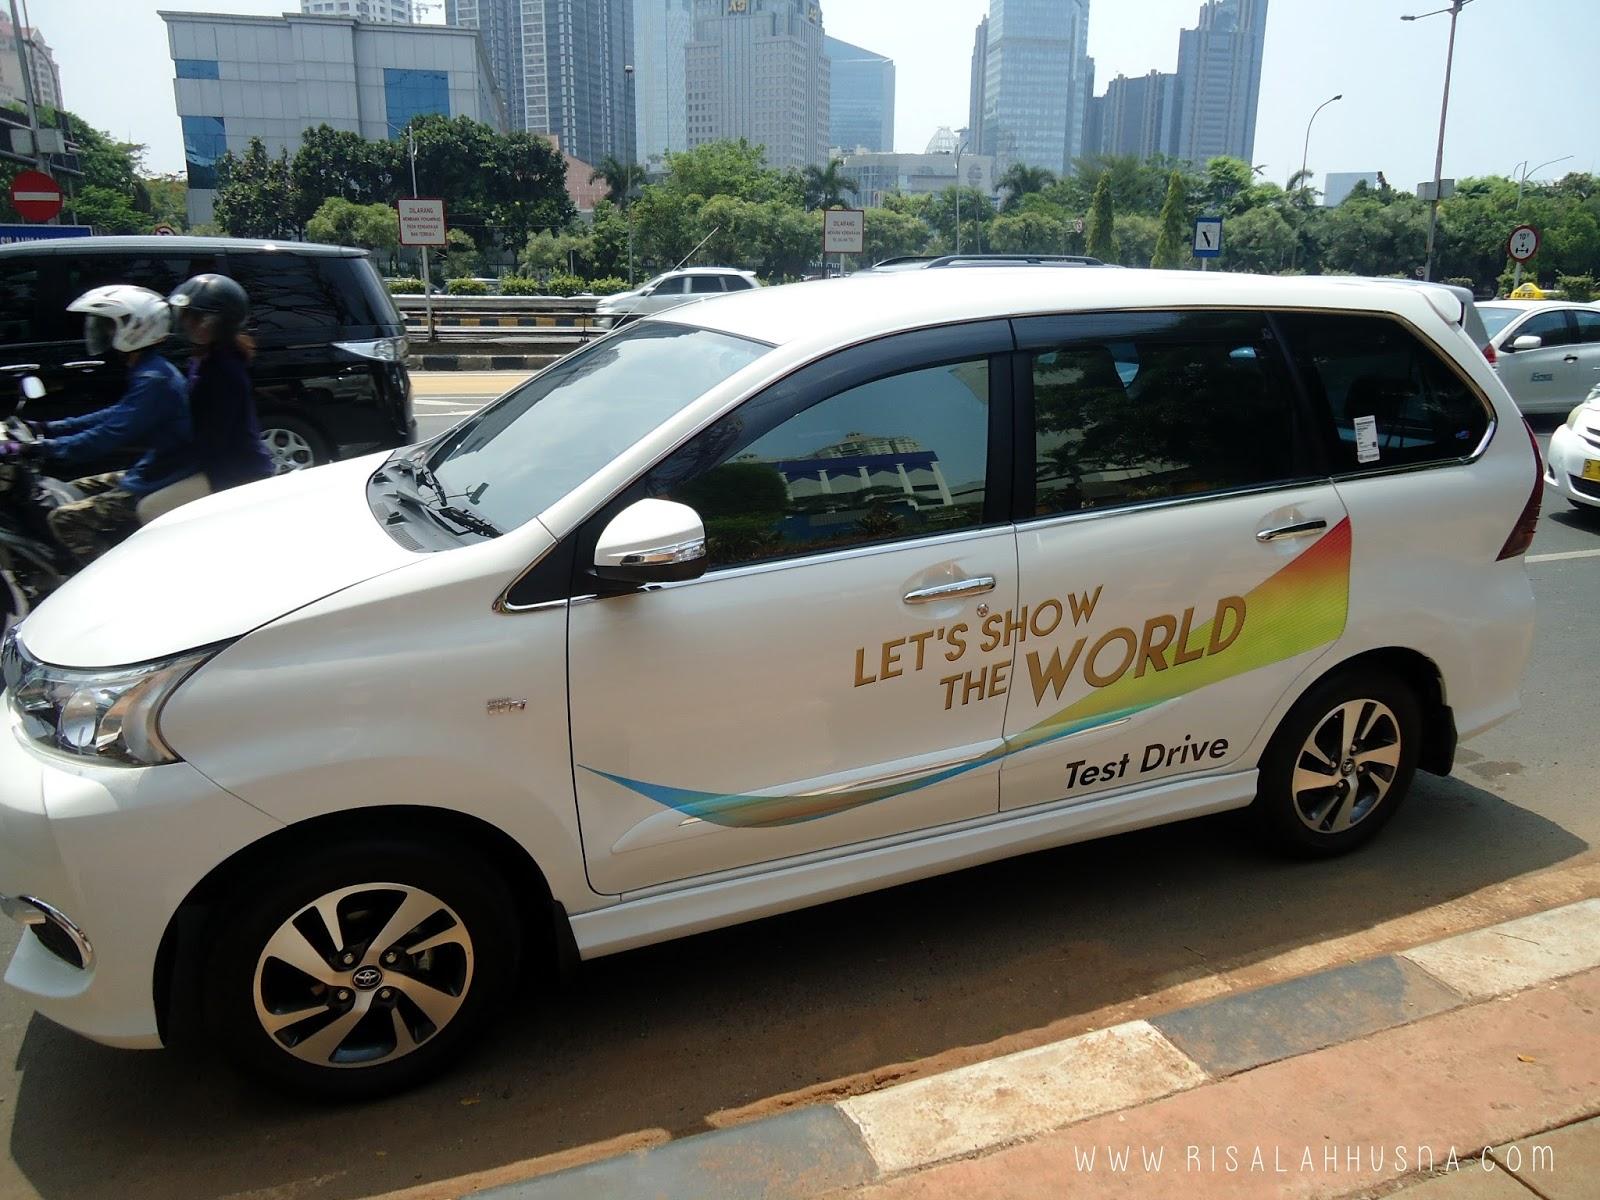 Toyota Grand New Veloz 2015 All Camry Hybrid 2018 Risalah Husna One Day Challenge Ke Ah Poong Sentul Bersama Putih Teman Saya Selama